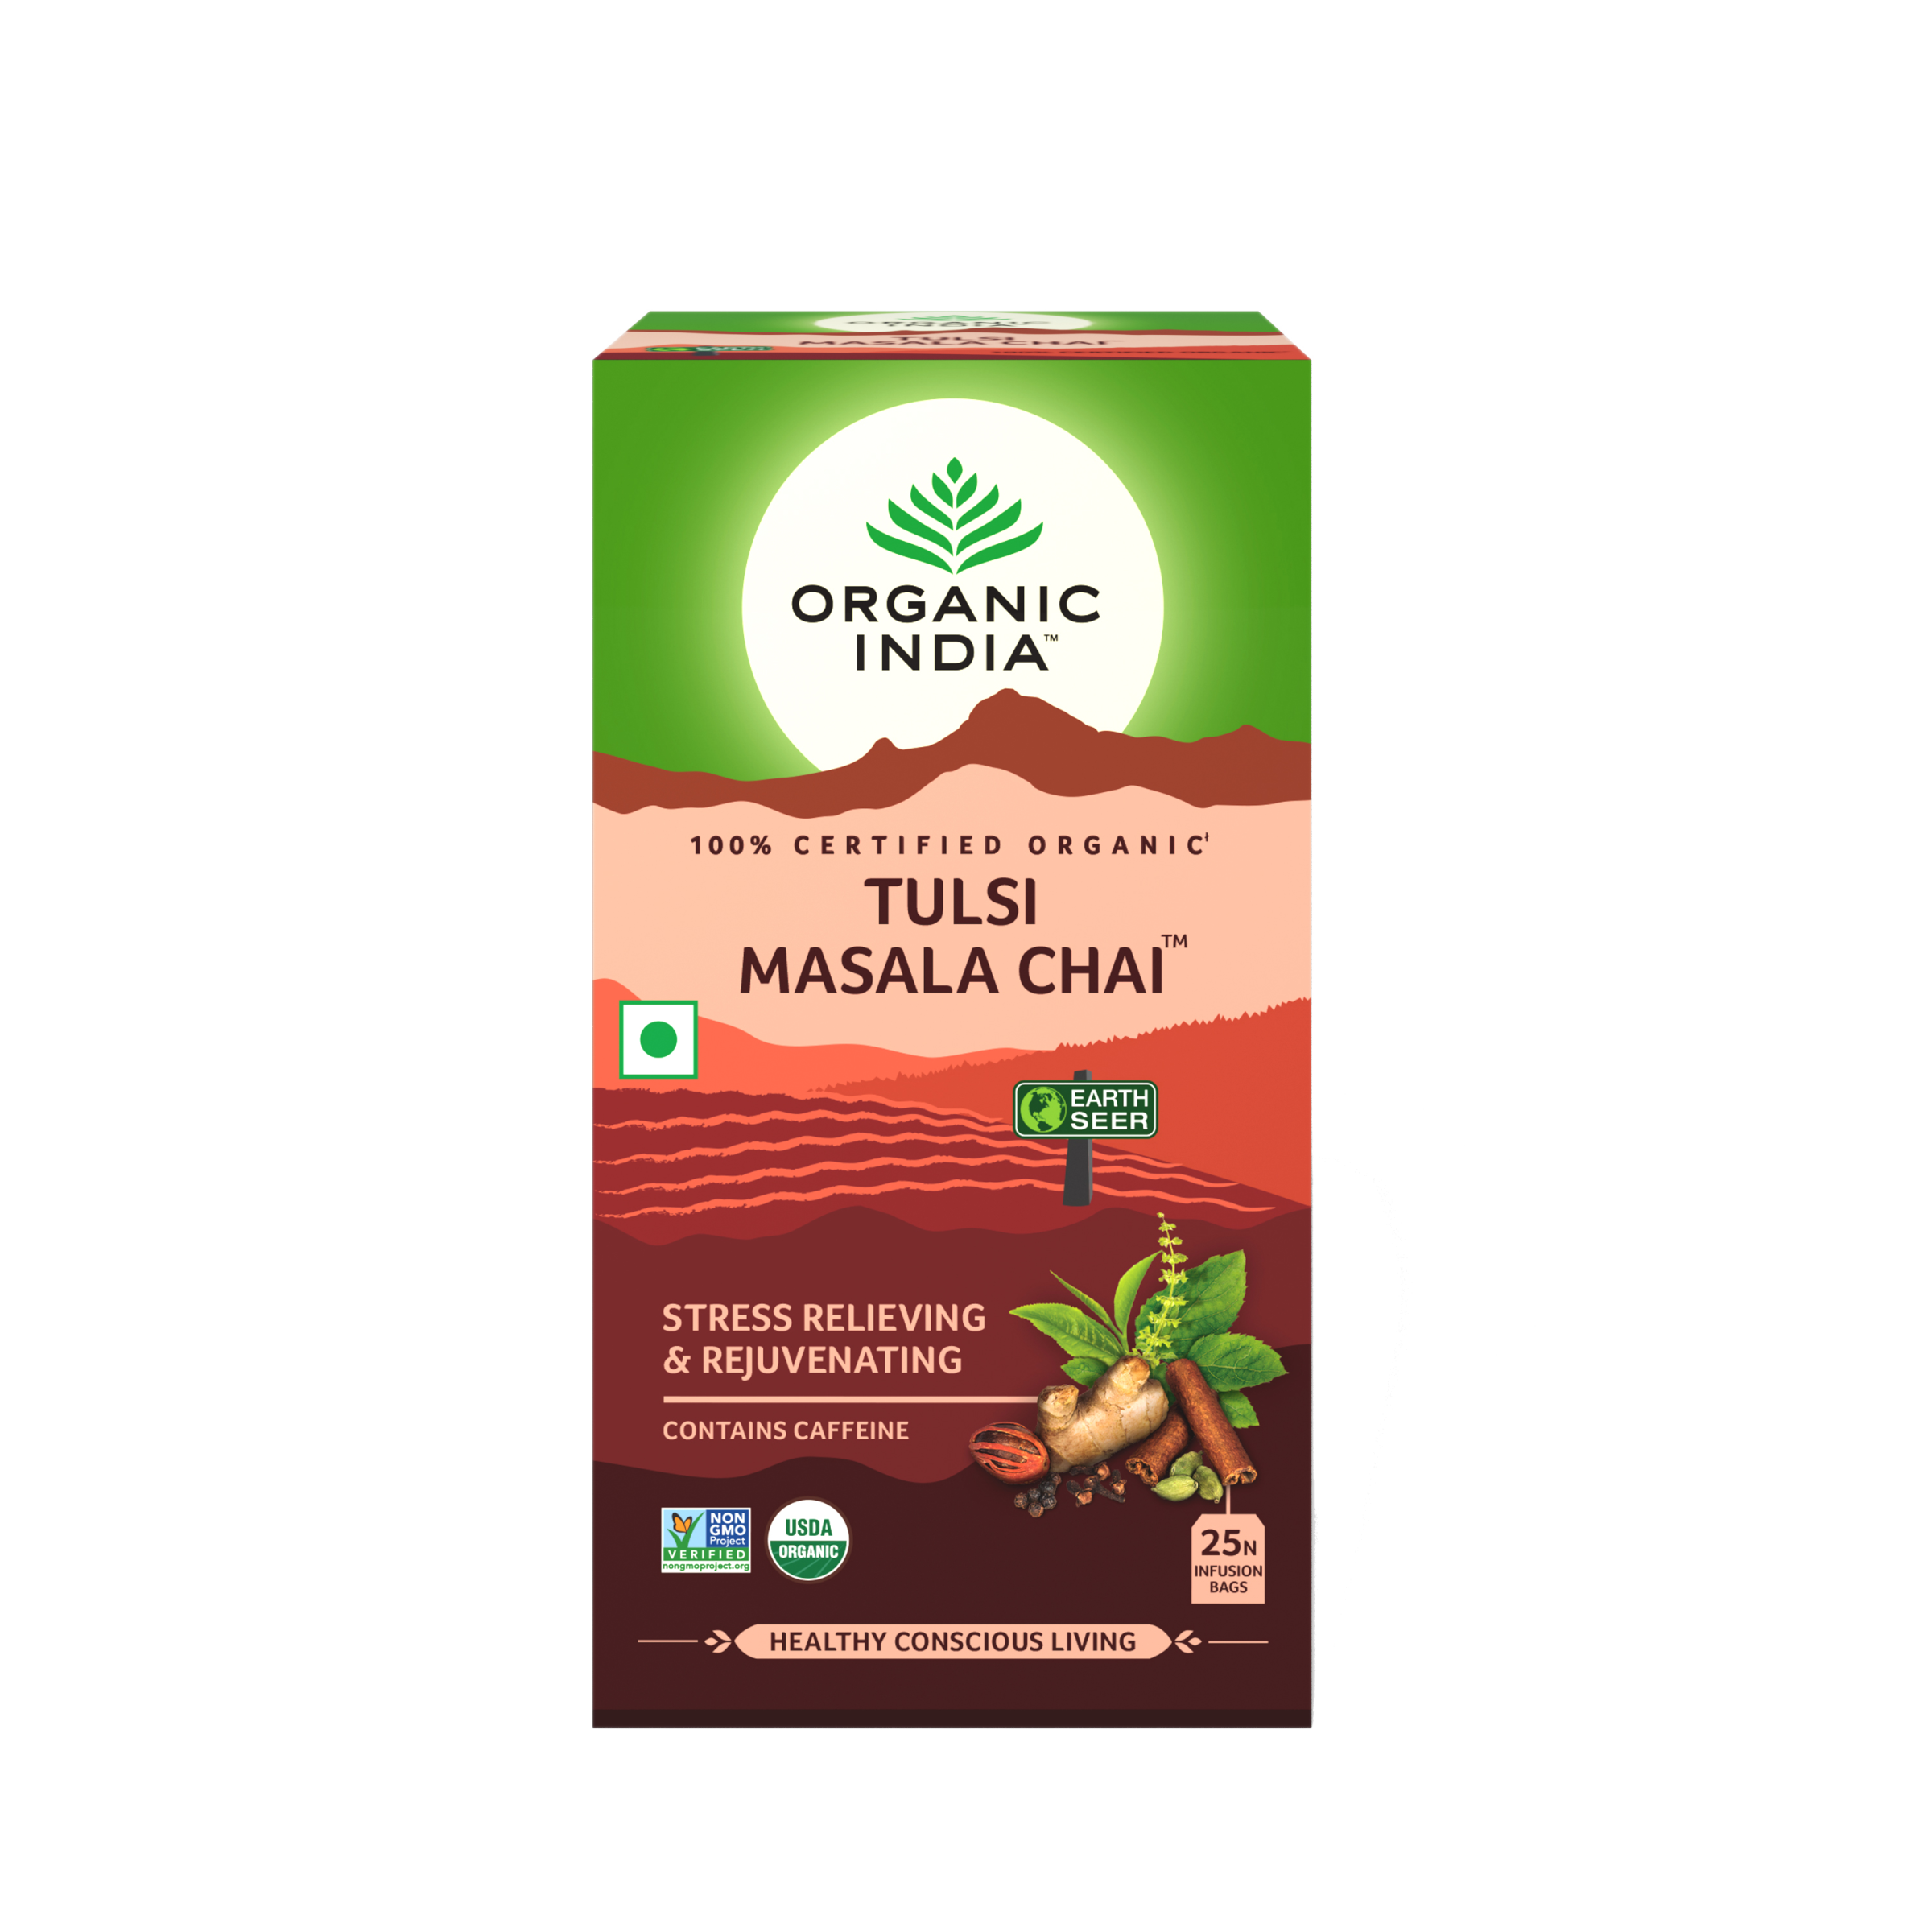 Té Organic India Tulsi en bolsa Masala Chai